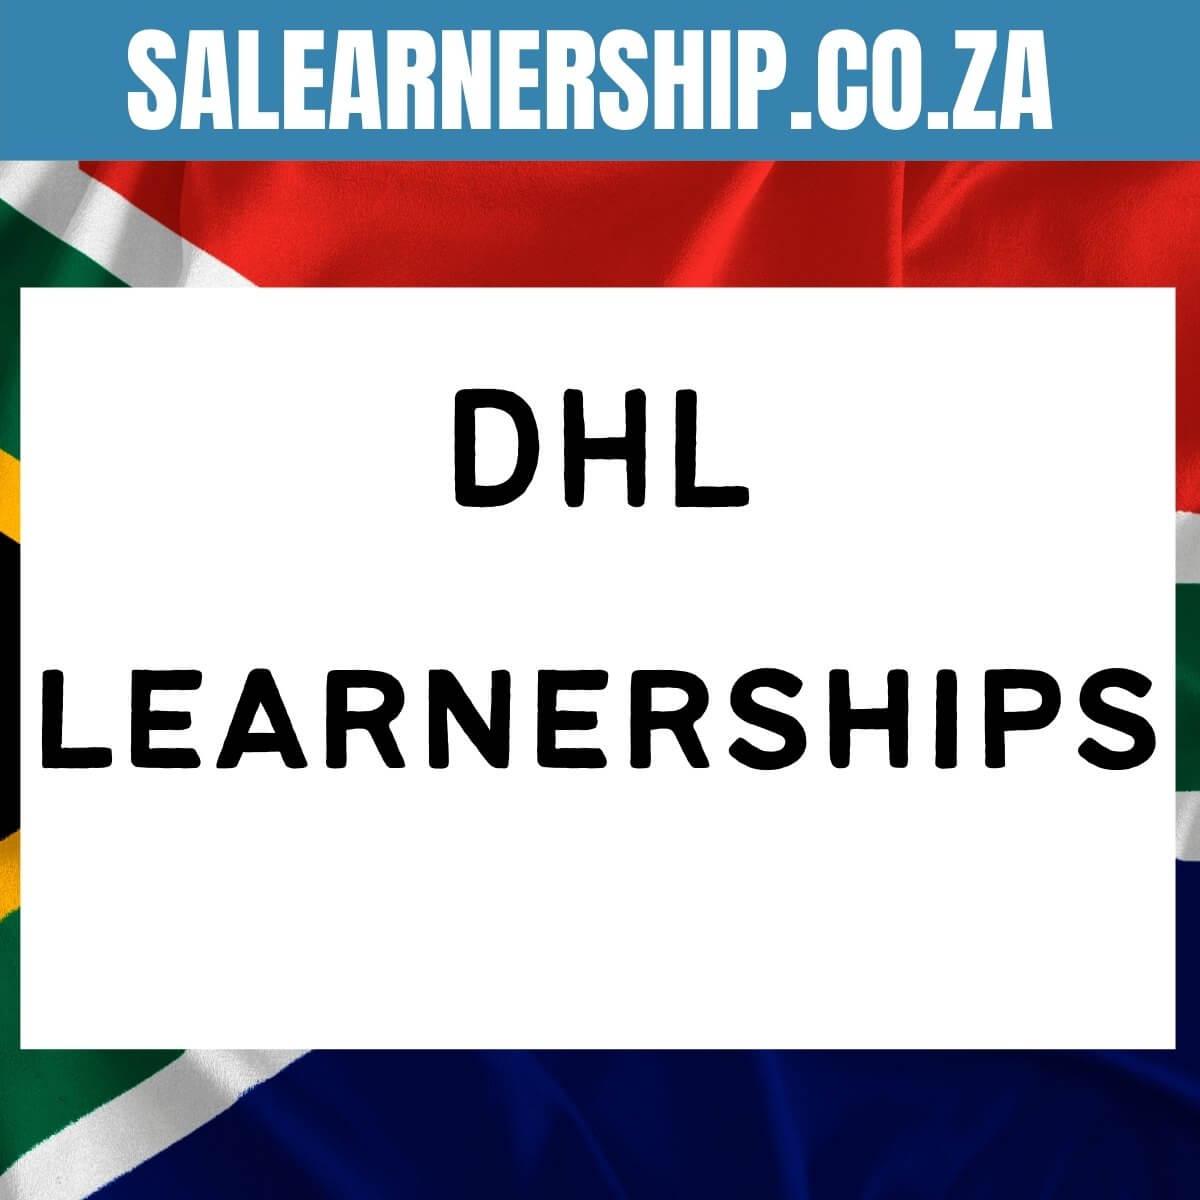 DHL learnerships